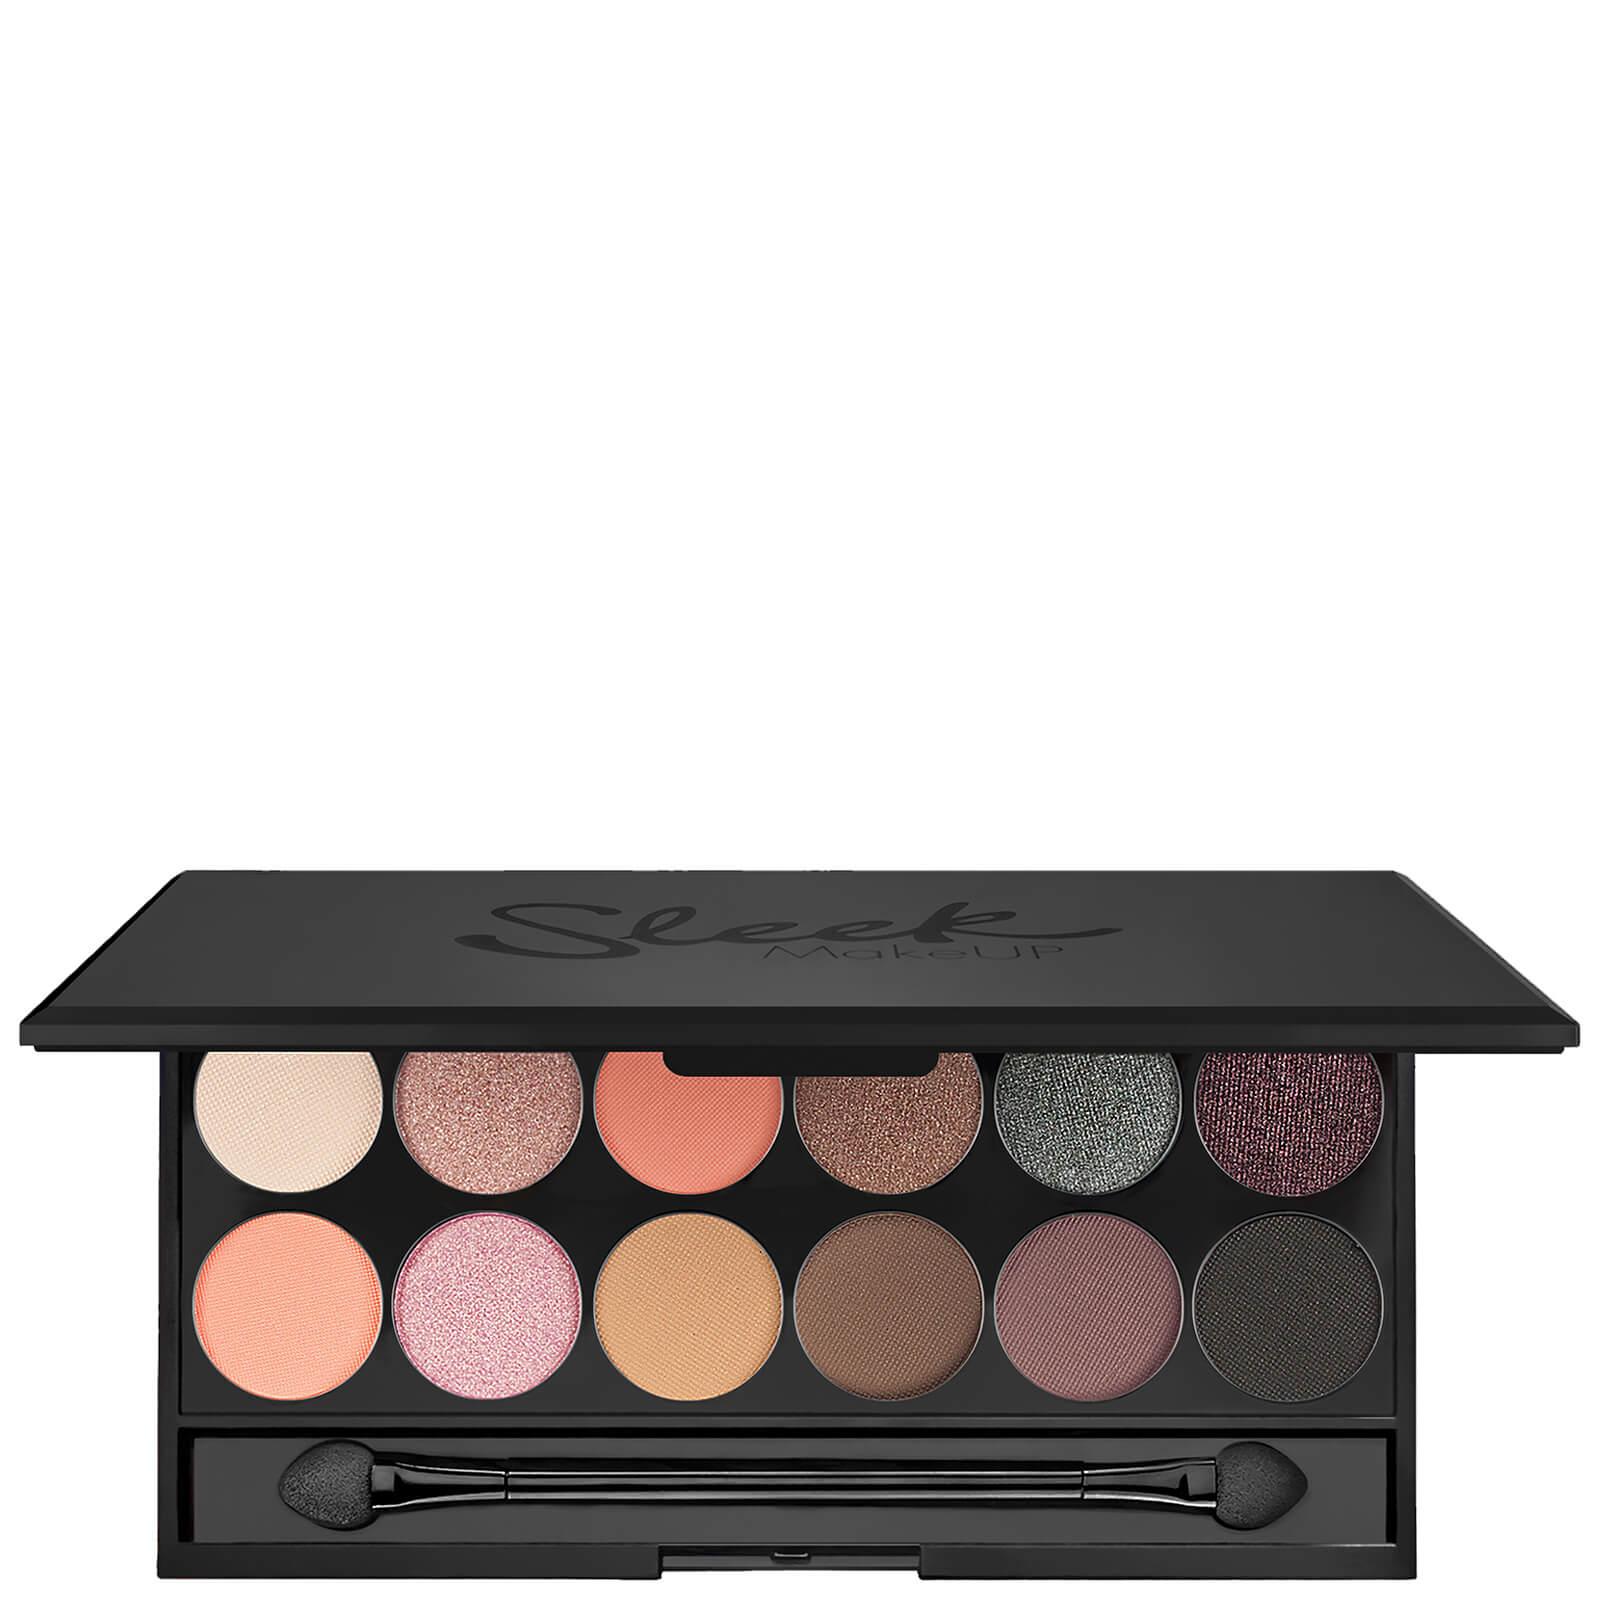 Купить Палетка теней для век Sleek MakeUP I-Divine Palette - Oh So Special 13, 2 г